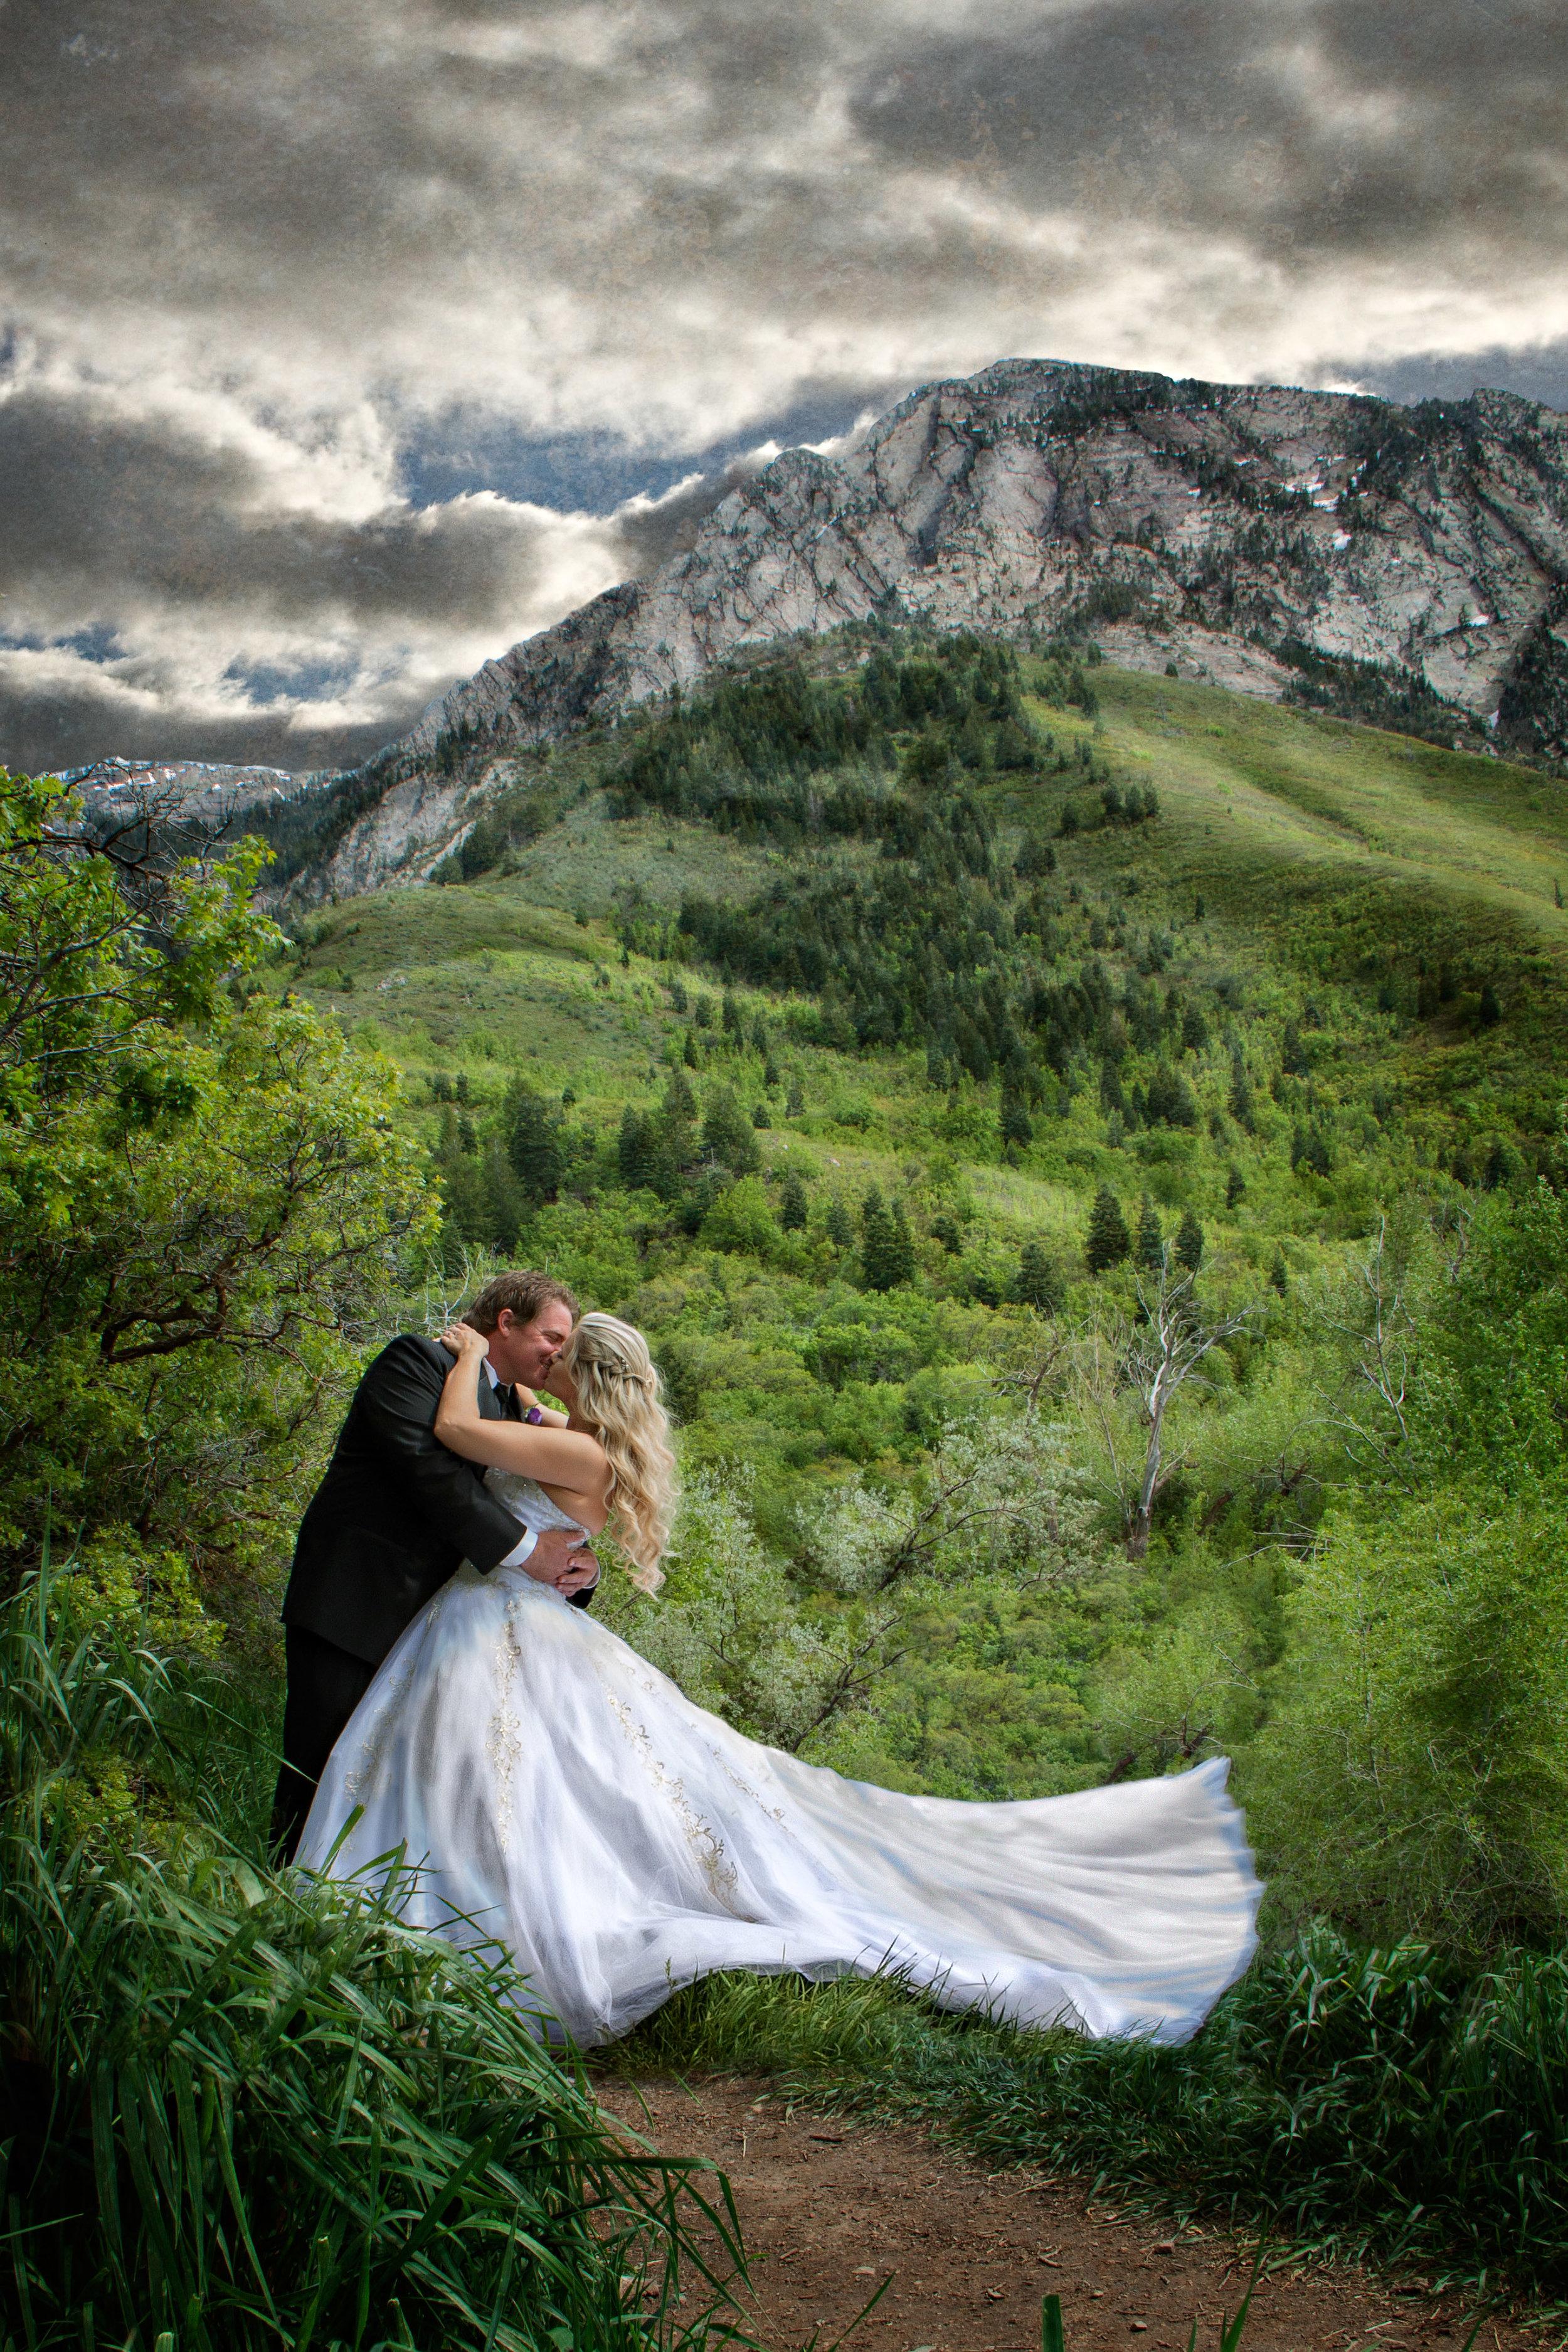 salt-lake-city-wedding-photographer.jpg